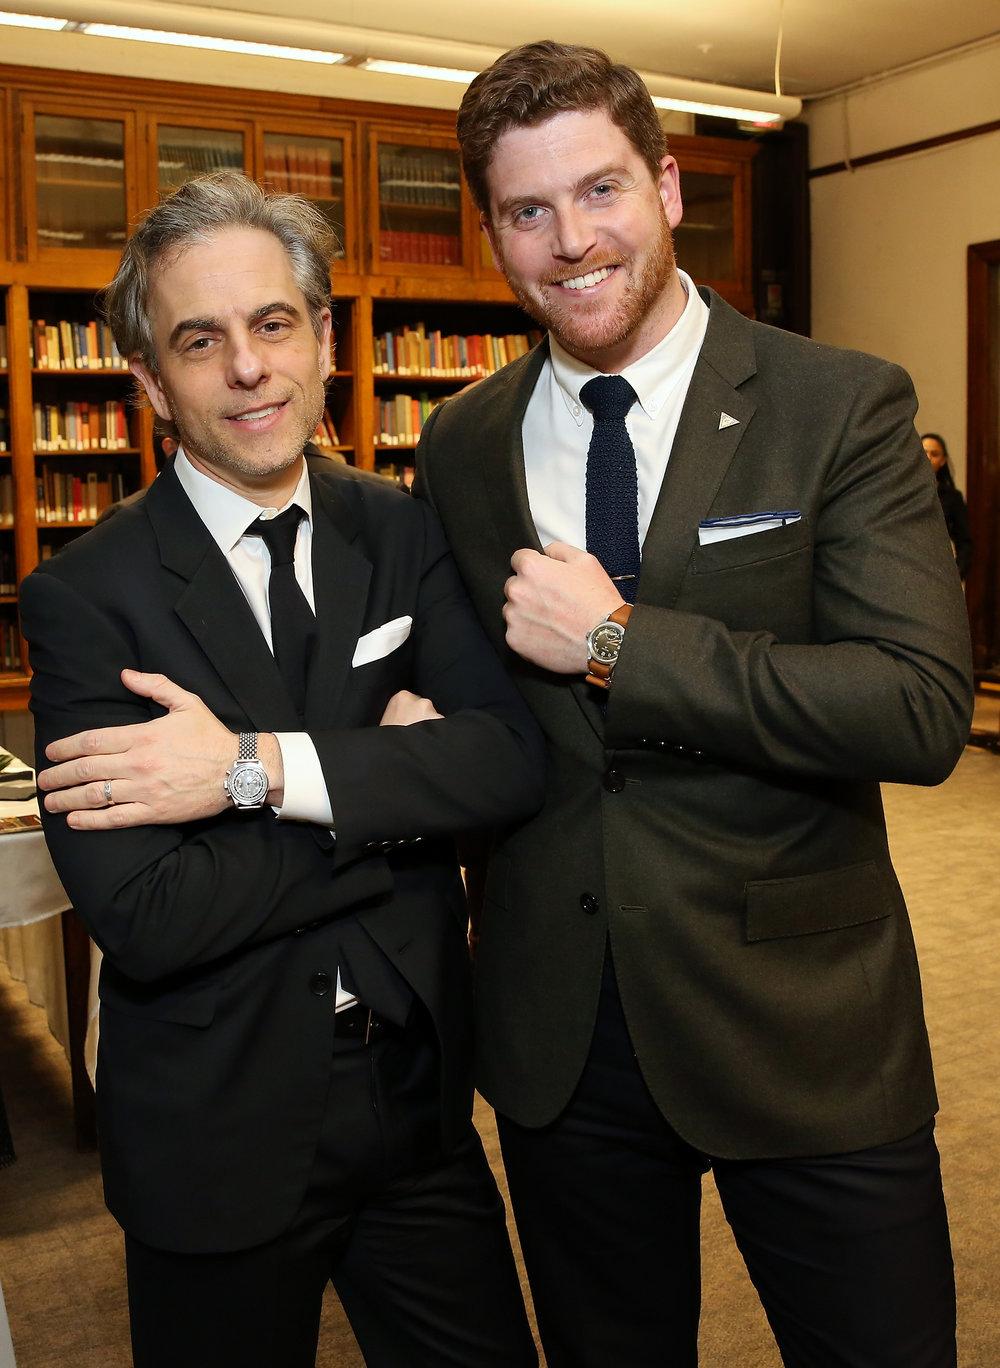 Geoffrey Hess and Jacob Sotak